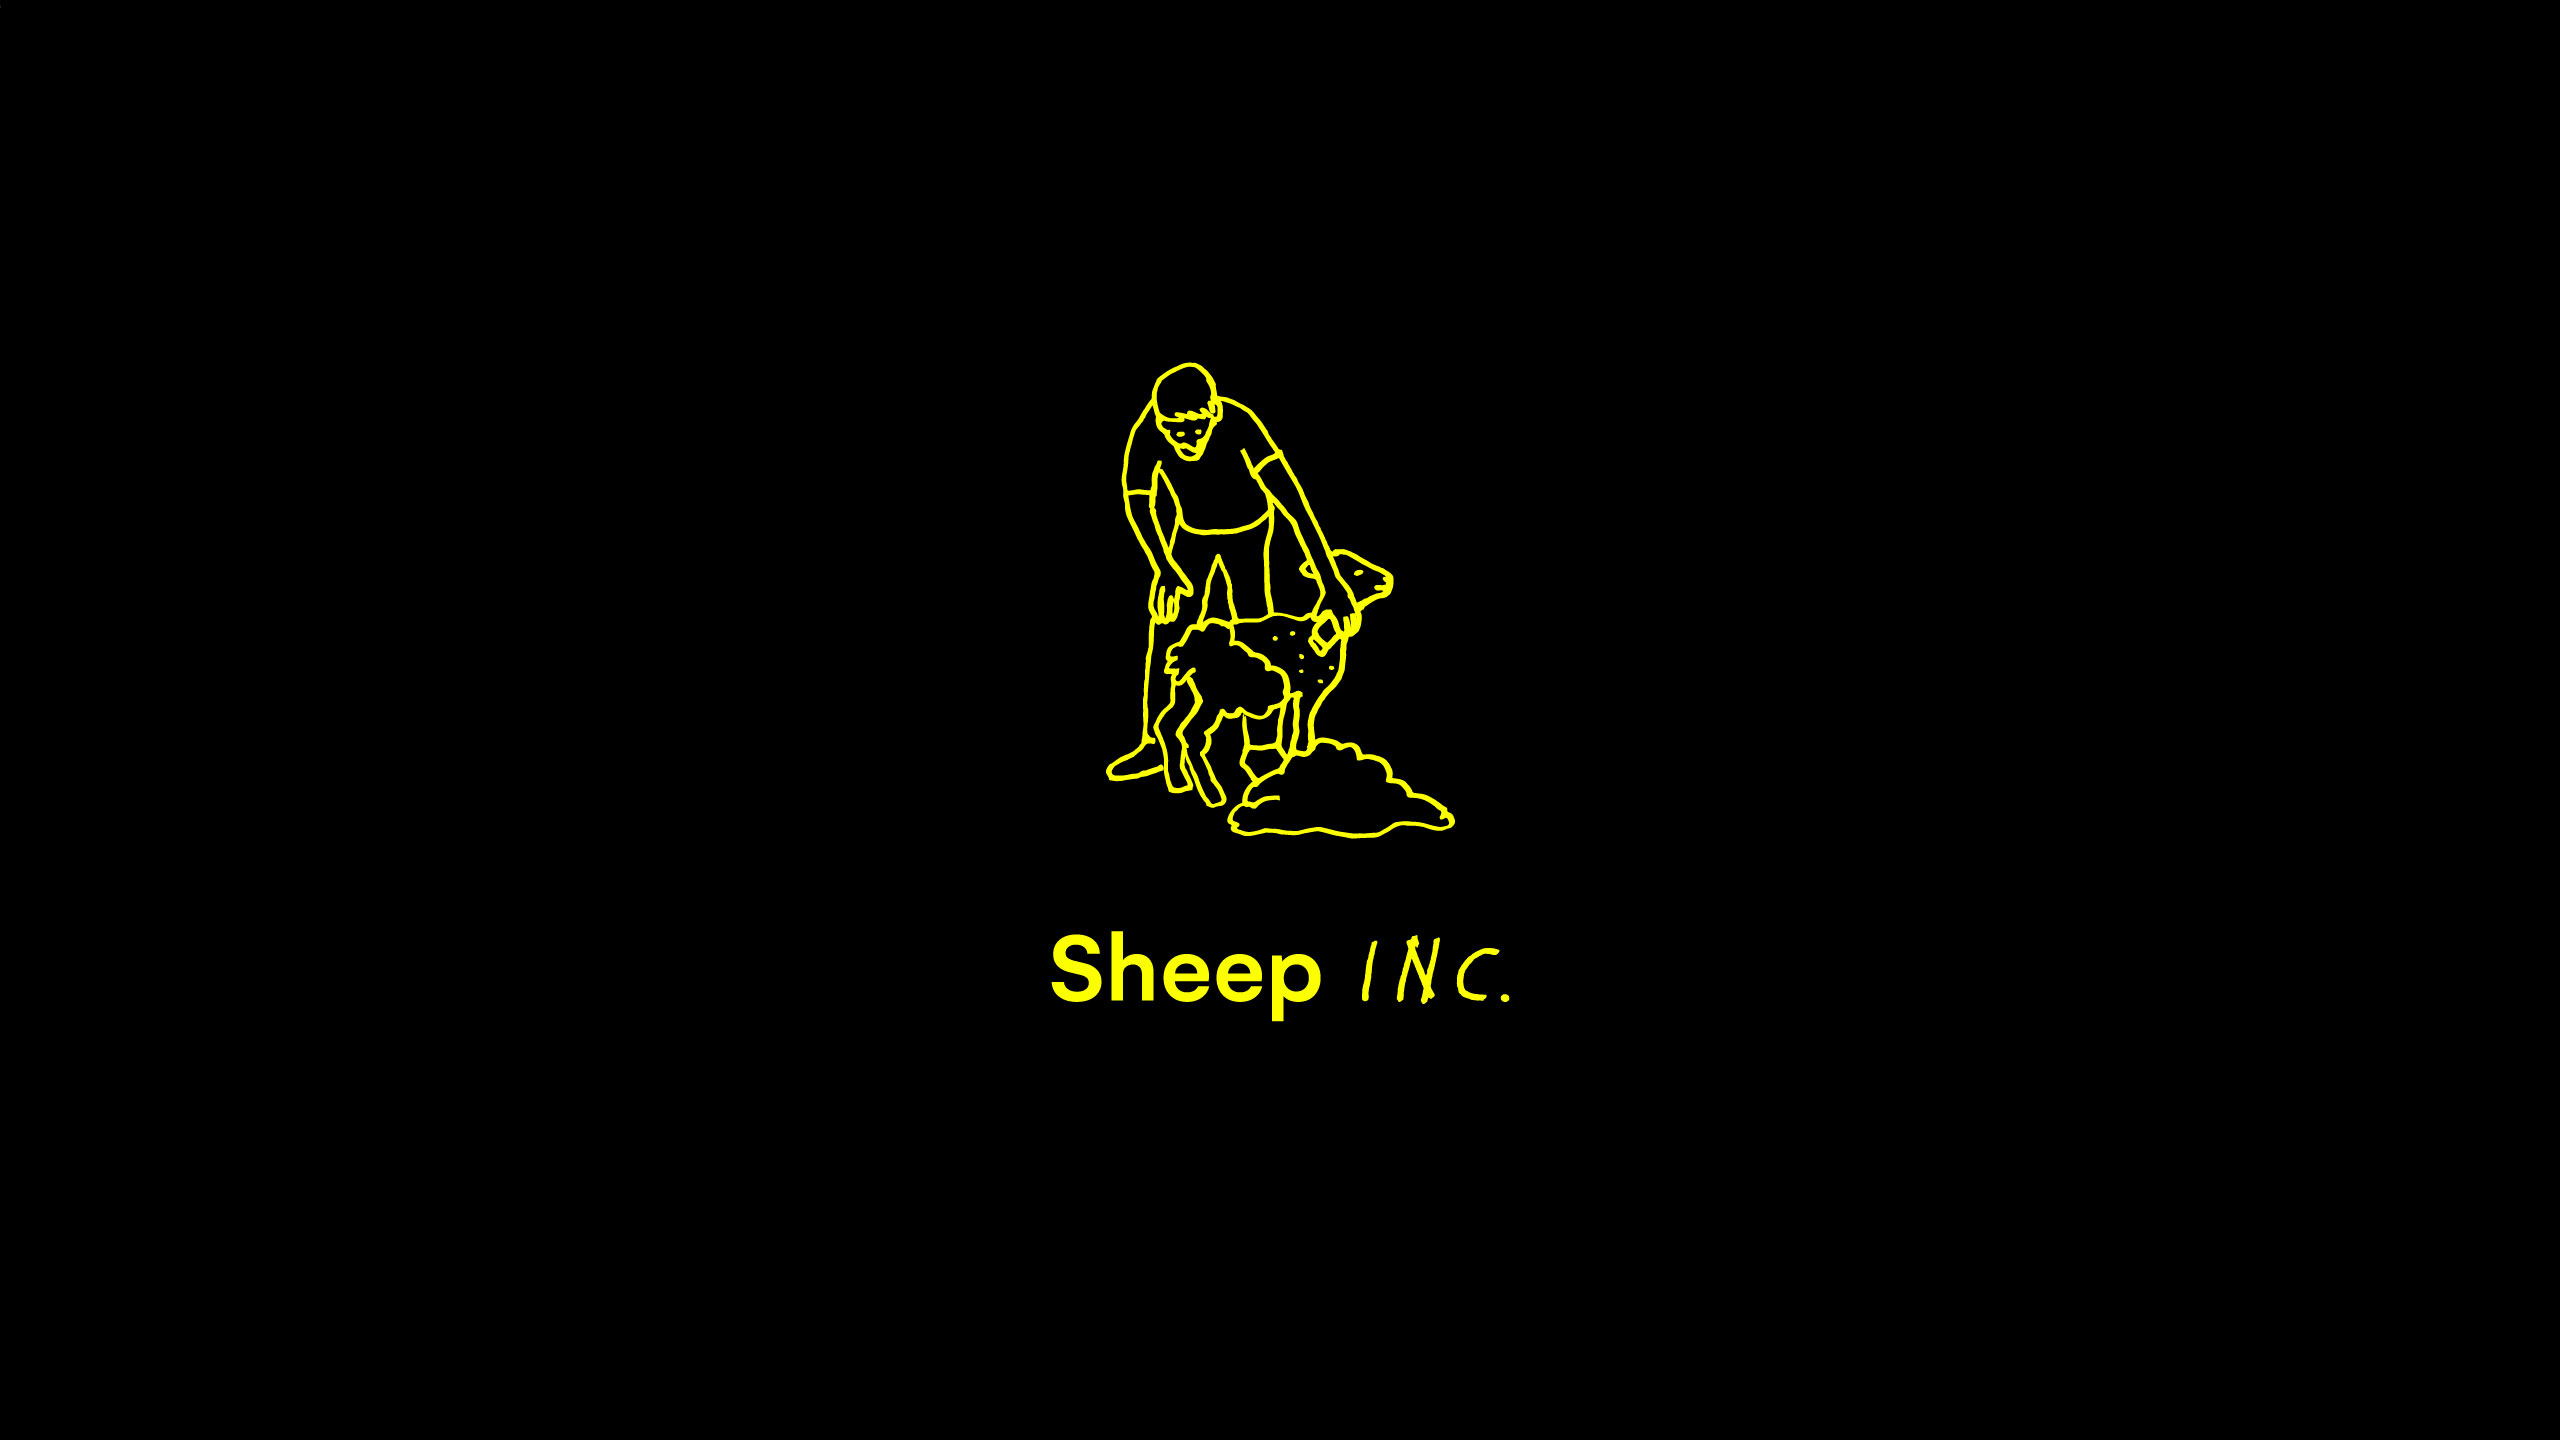 SheepInc